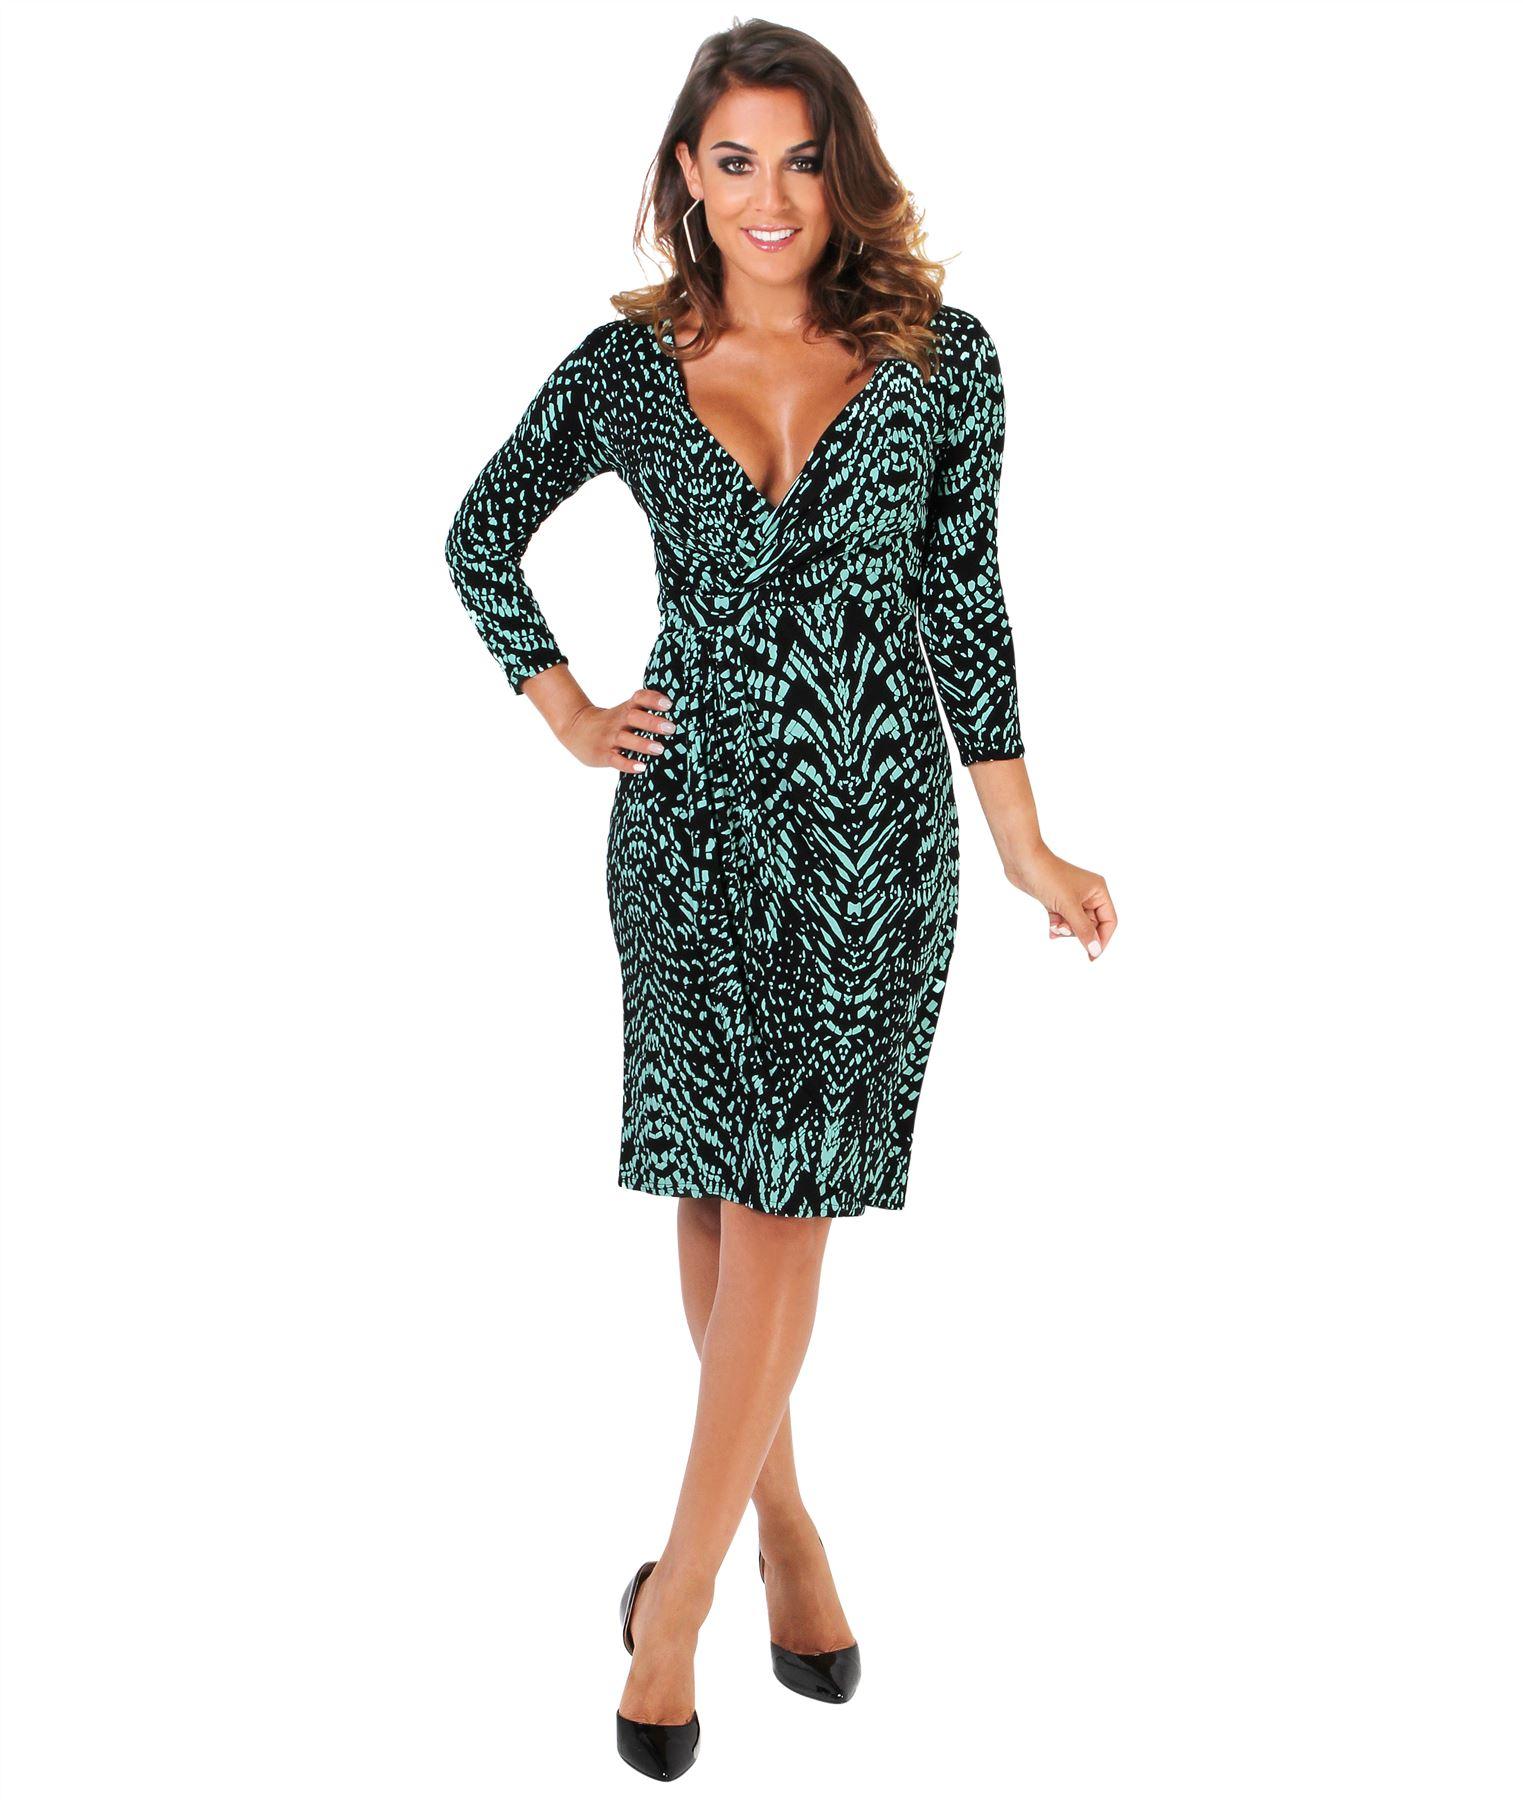 Womens-V-Neck-Dress-Top-Bodycon-Skirt-Midi-Snakeskin-Print-Cross-Over-Party-Wrap thumbnail 21